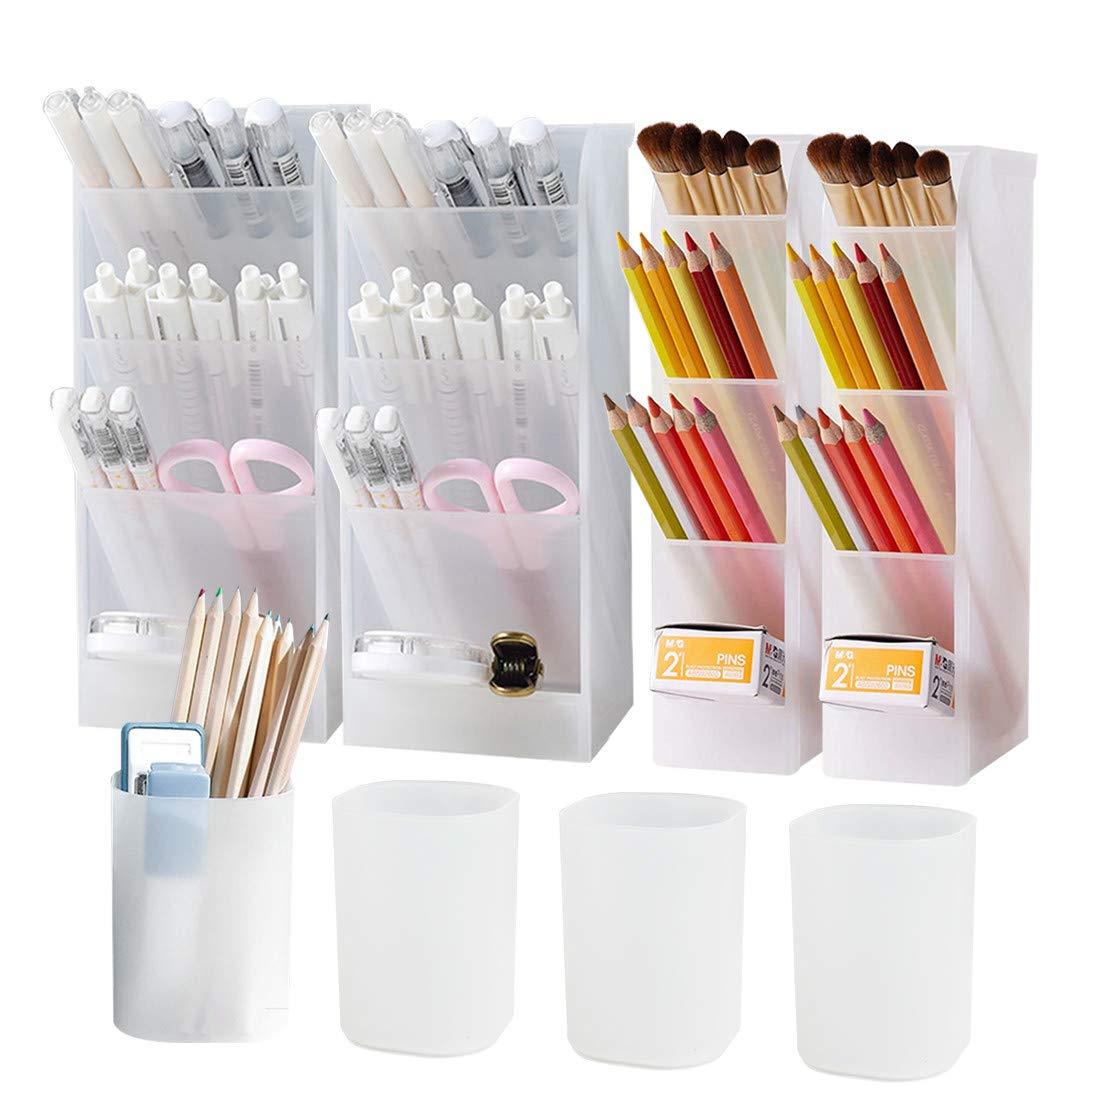 8Pcs Desk Organizer- Pen Organizer Storage for Office, School, Home Supplies, Translucent White Pen Storage Holder, Set of 4, 4 Cups 20Compartments (White)